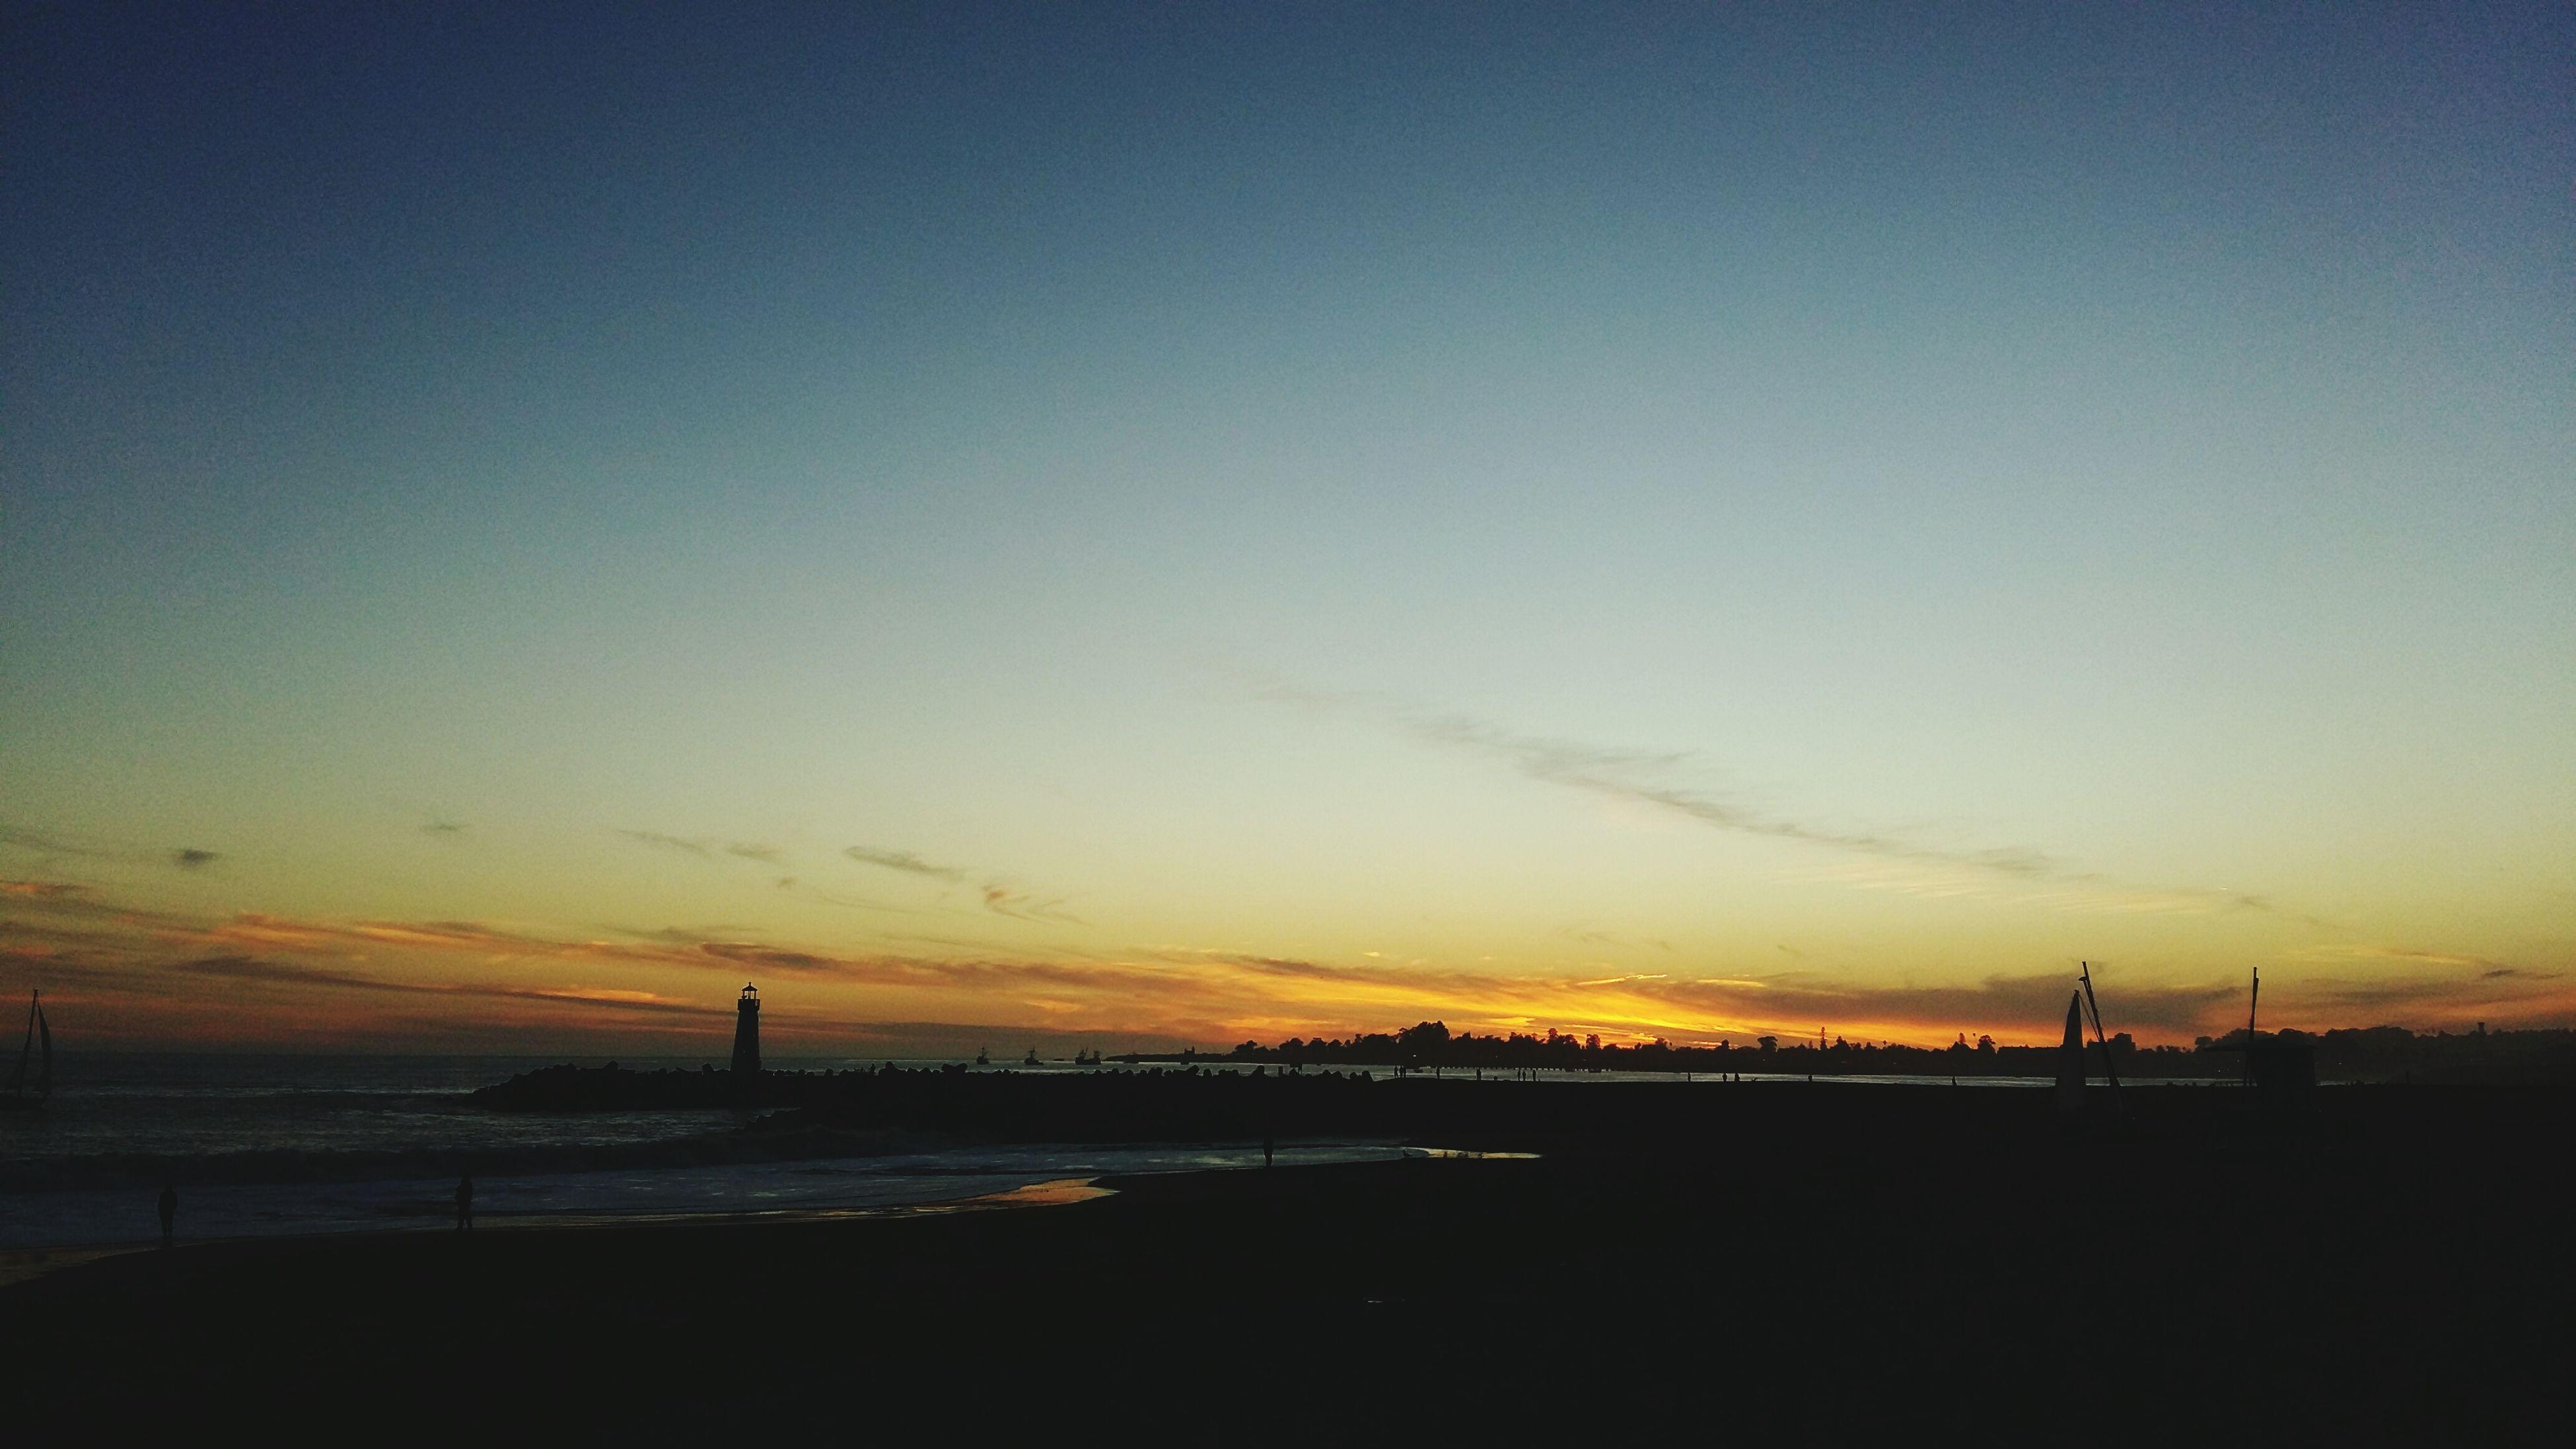 sunset, silhouette, connection, built structure, bridge - man made structure, architecture, sky, sea, water, engineering, suspension bridge, copy space, dusk, scenics, tranquility, orange color, tranquil scene, bridge, nature, travel destinations